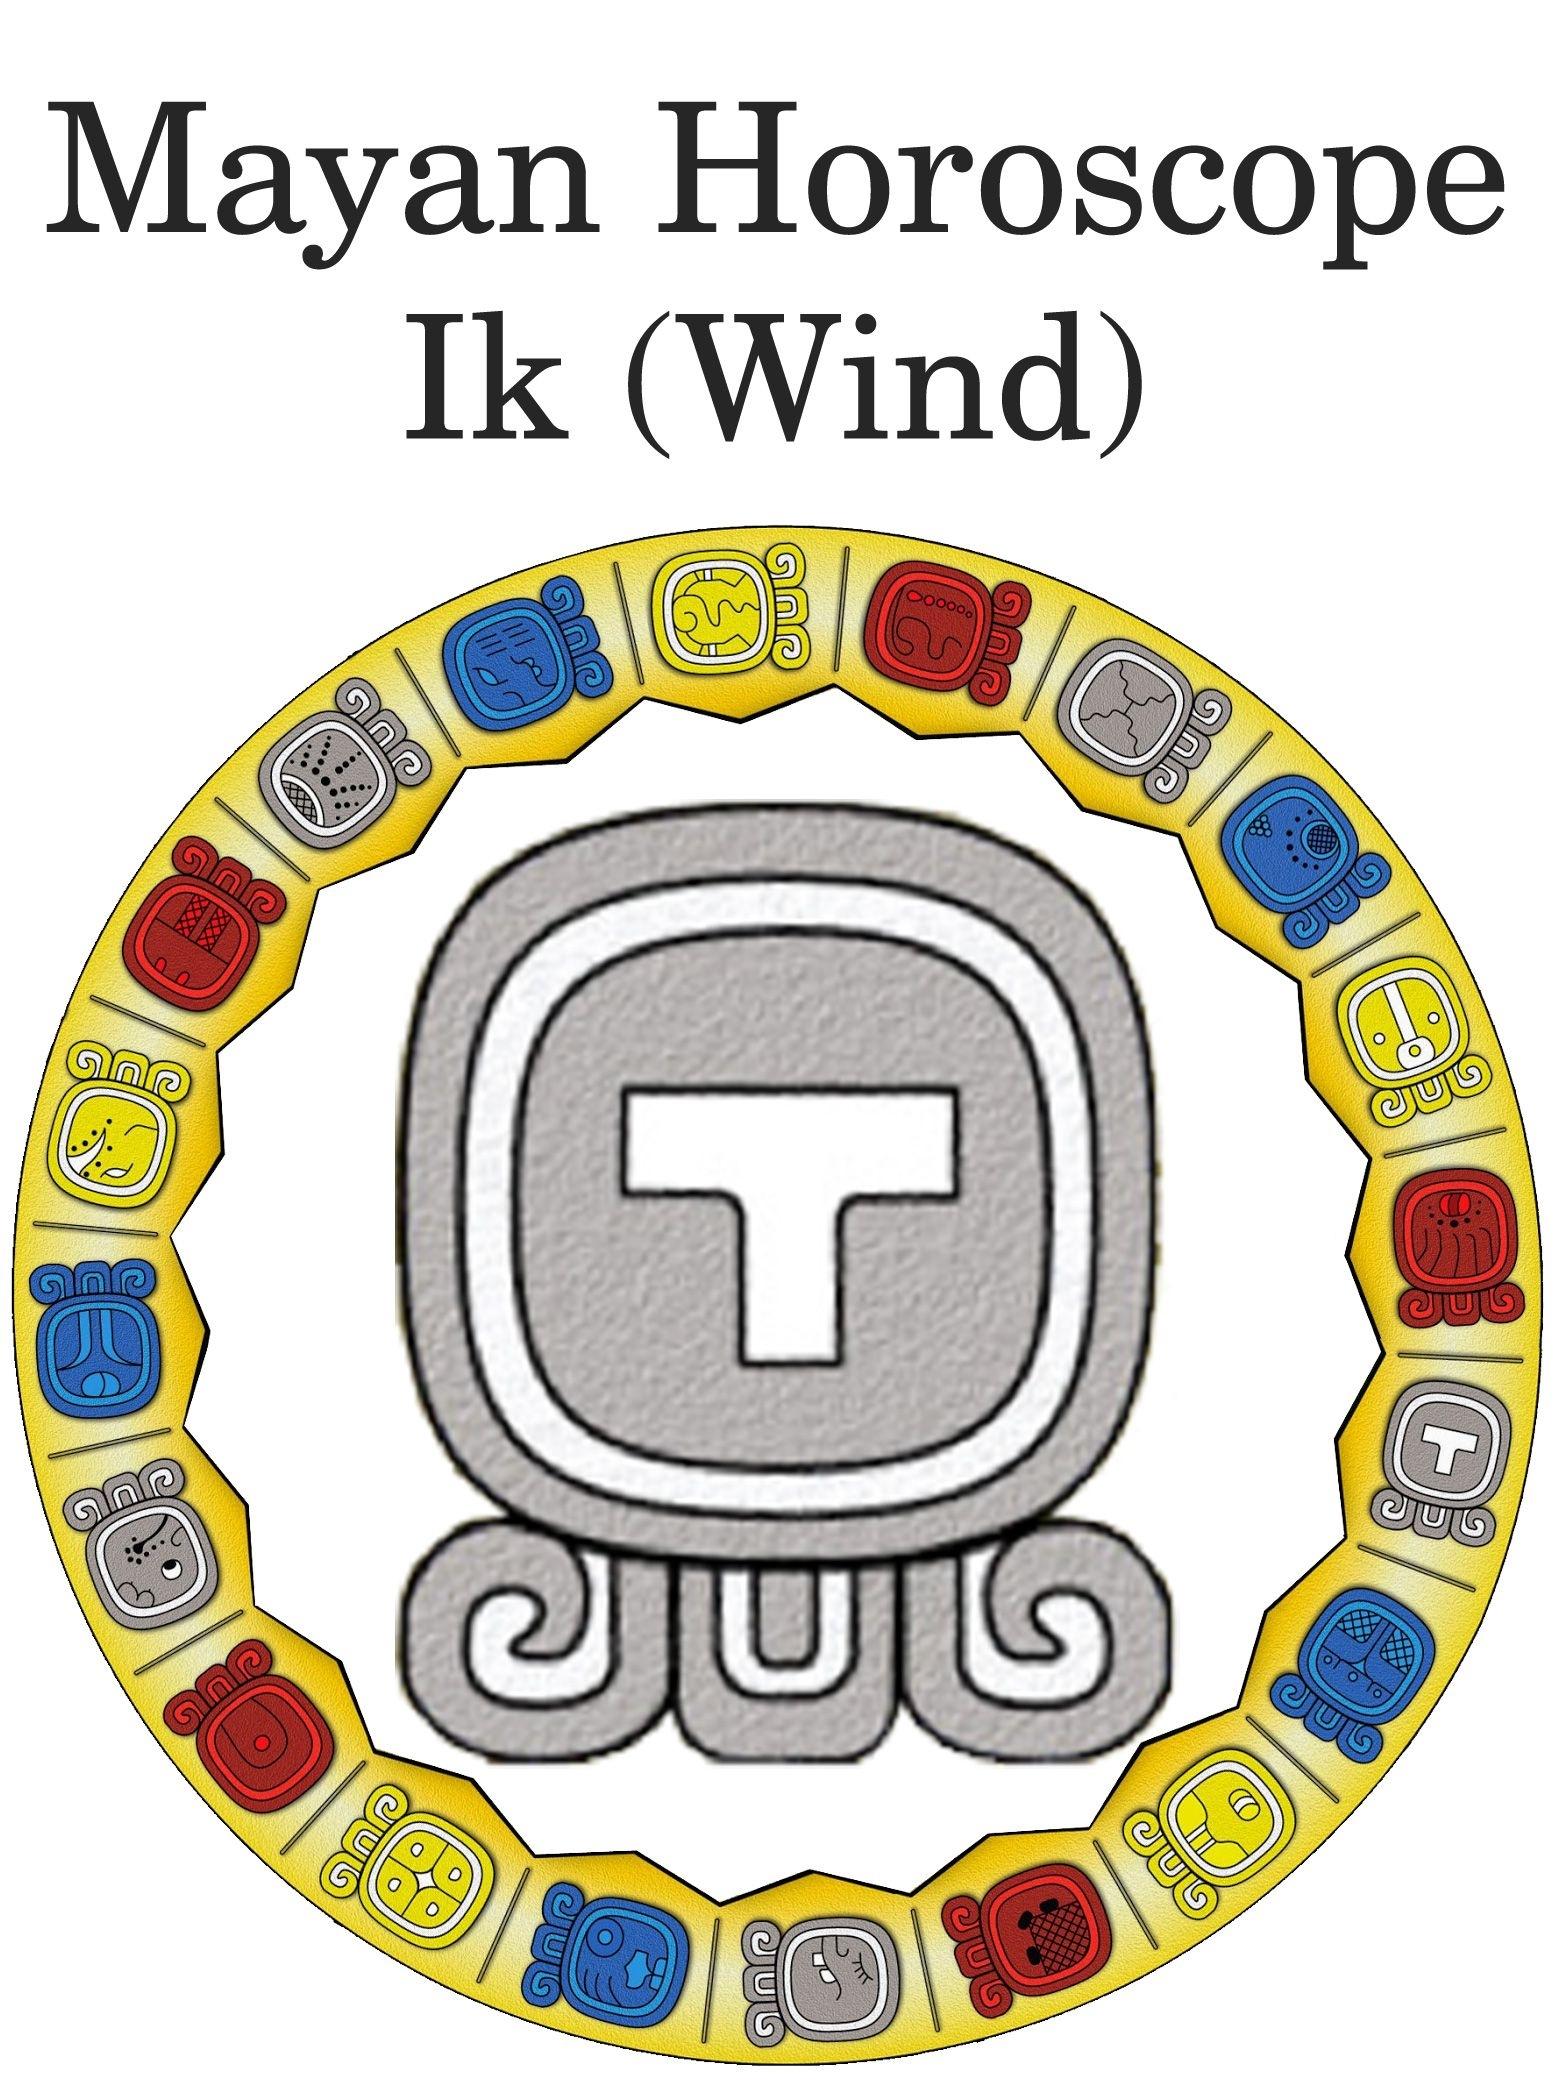 Ik (Wind) – Mayan Horoscope | Mayan Astrology, Horoscope